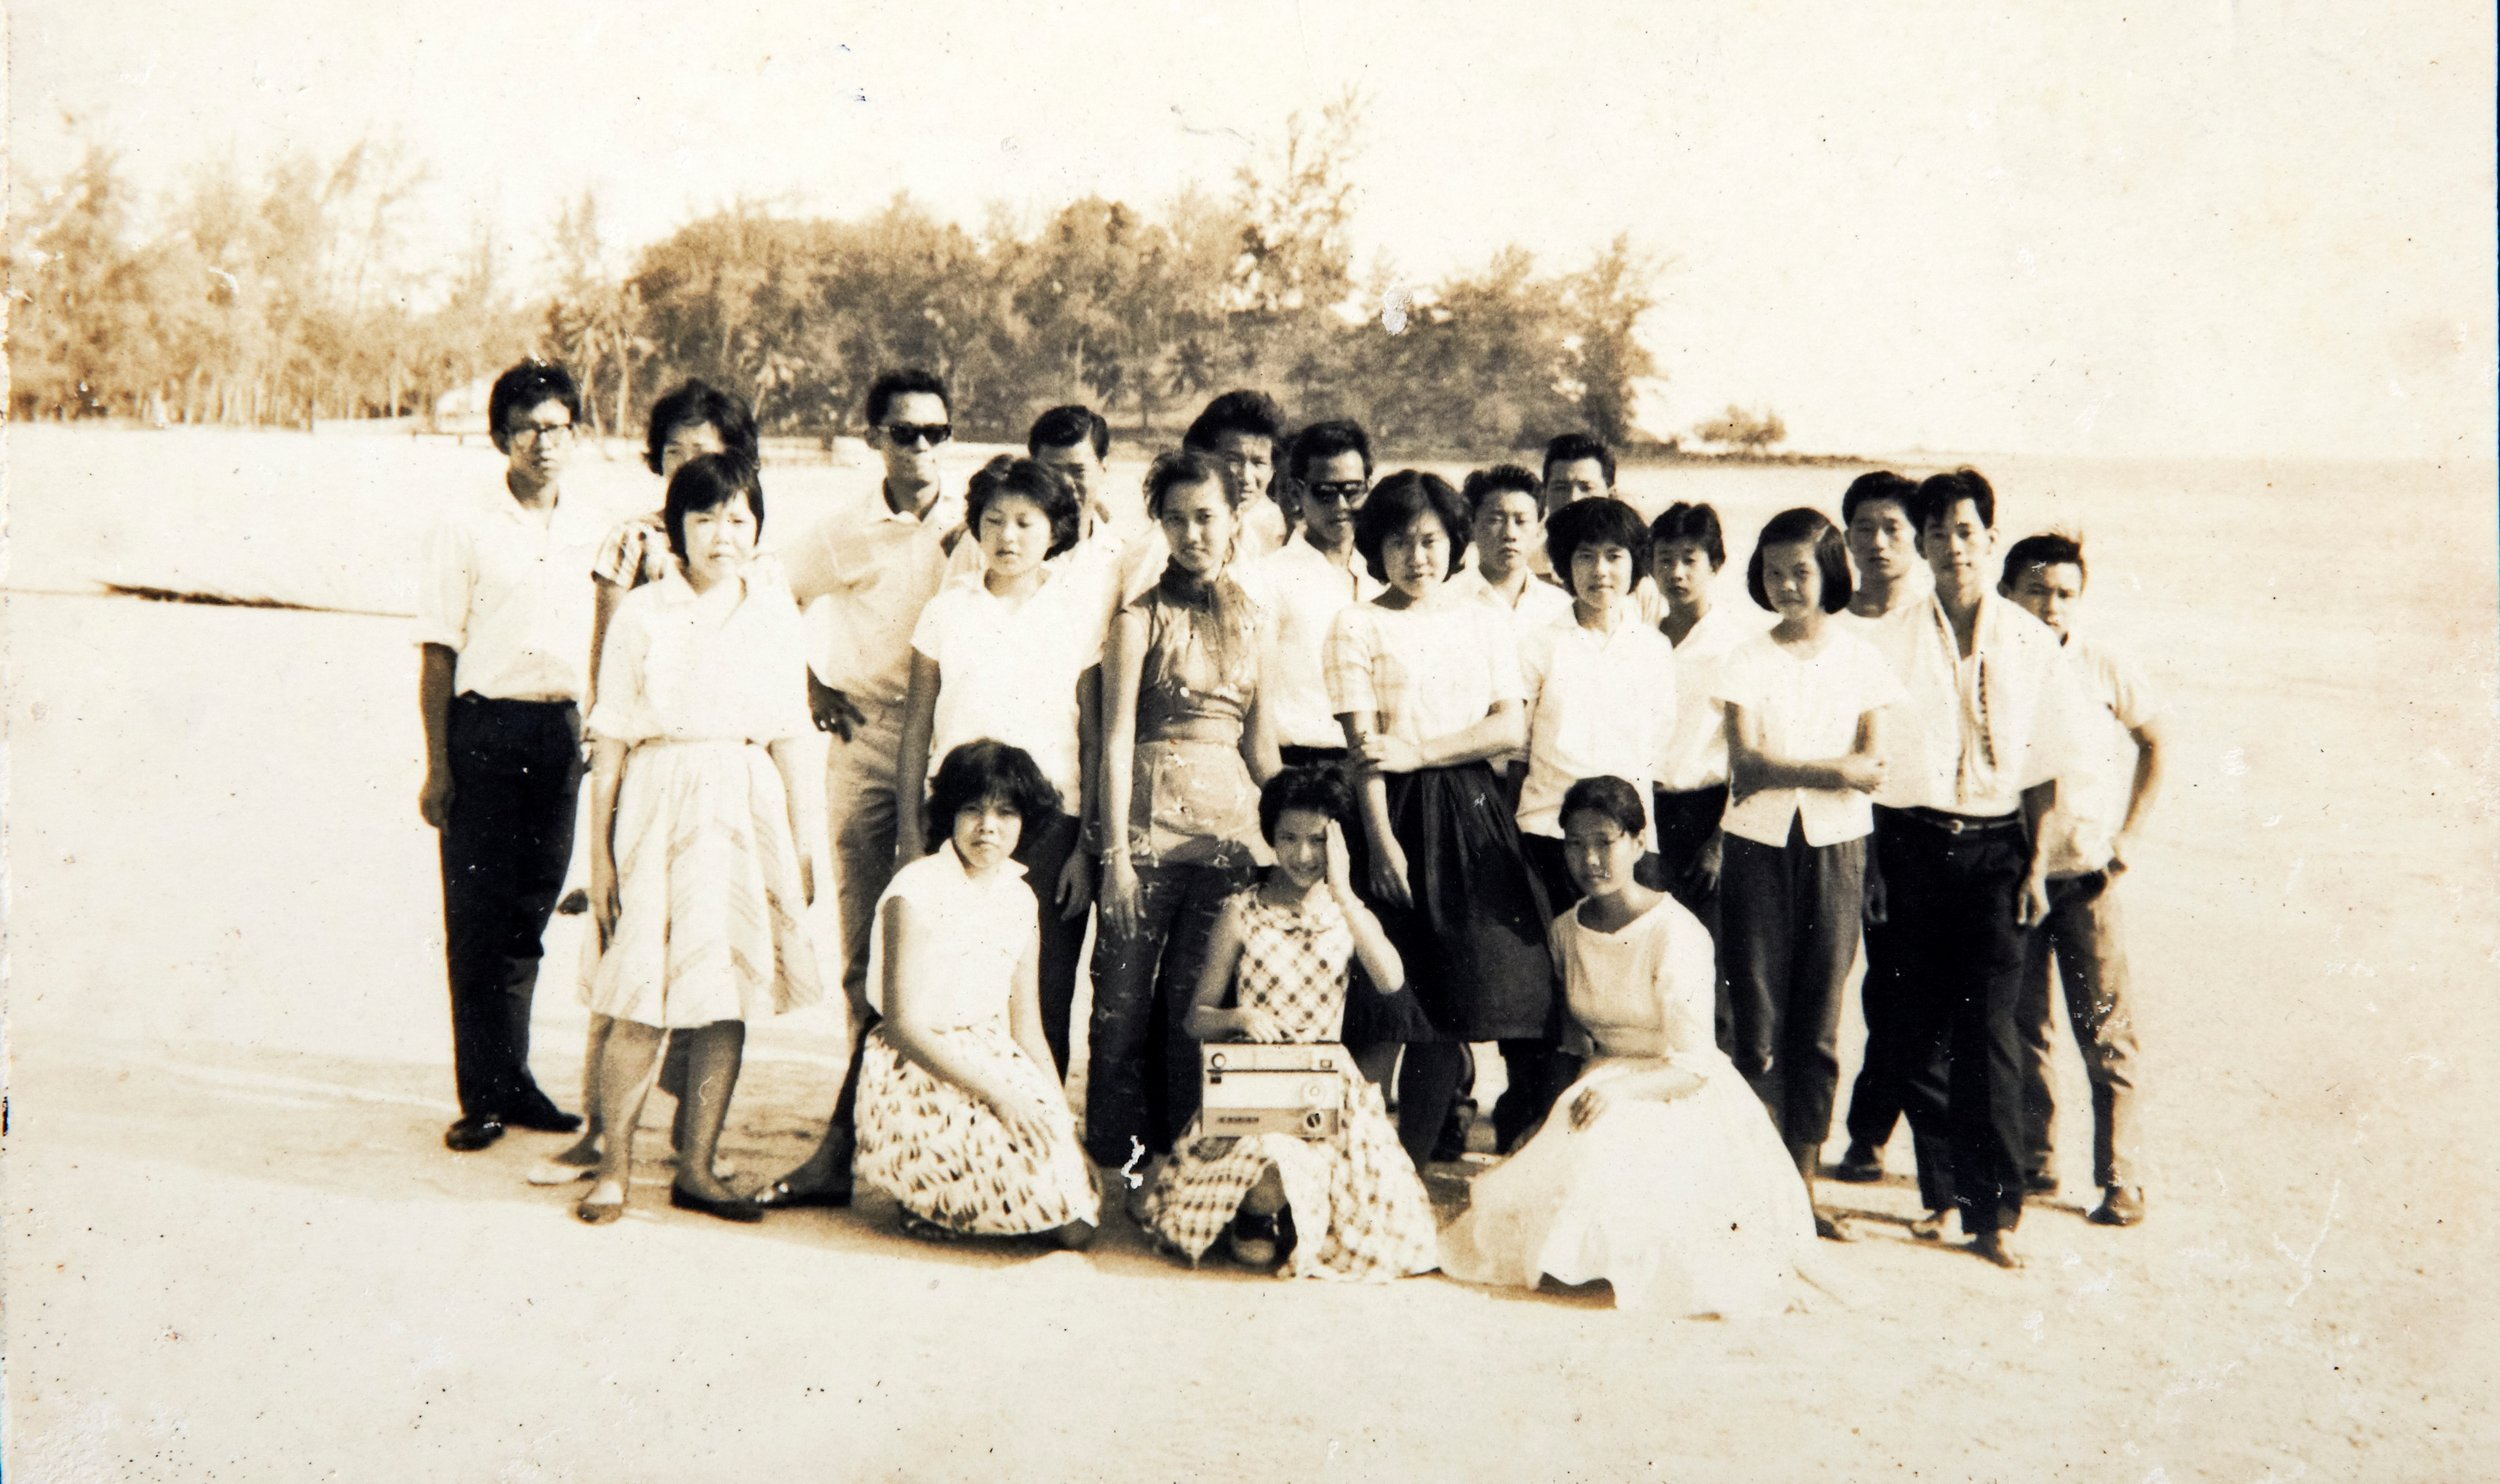 Patients visit to Morid seaside. (photo courtesy of Sungai Buloh Settlement Council)